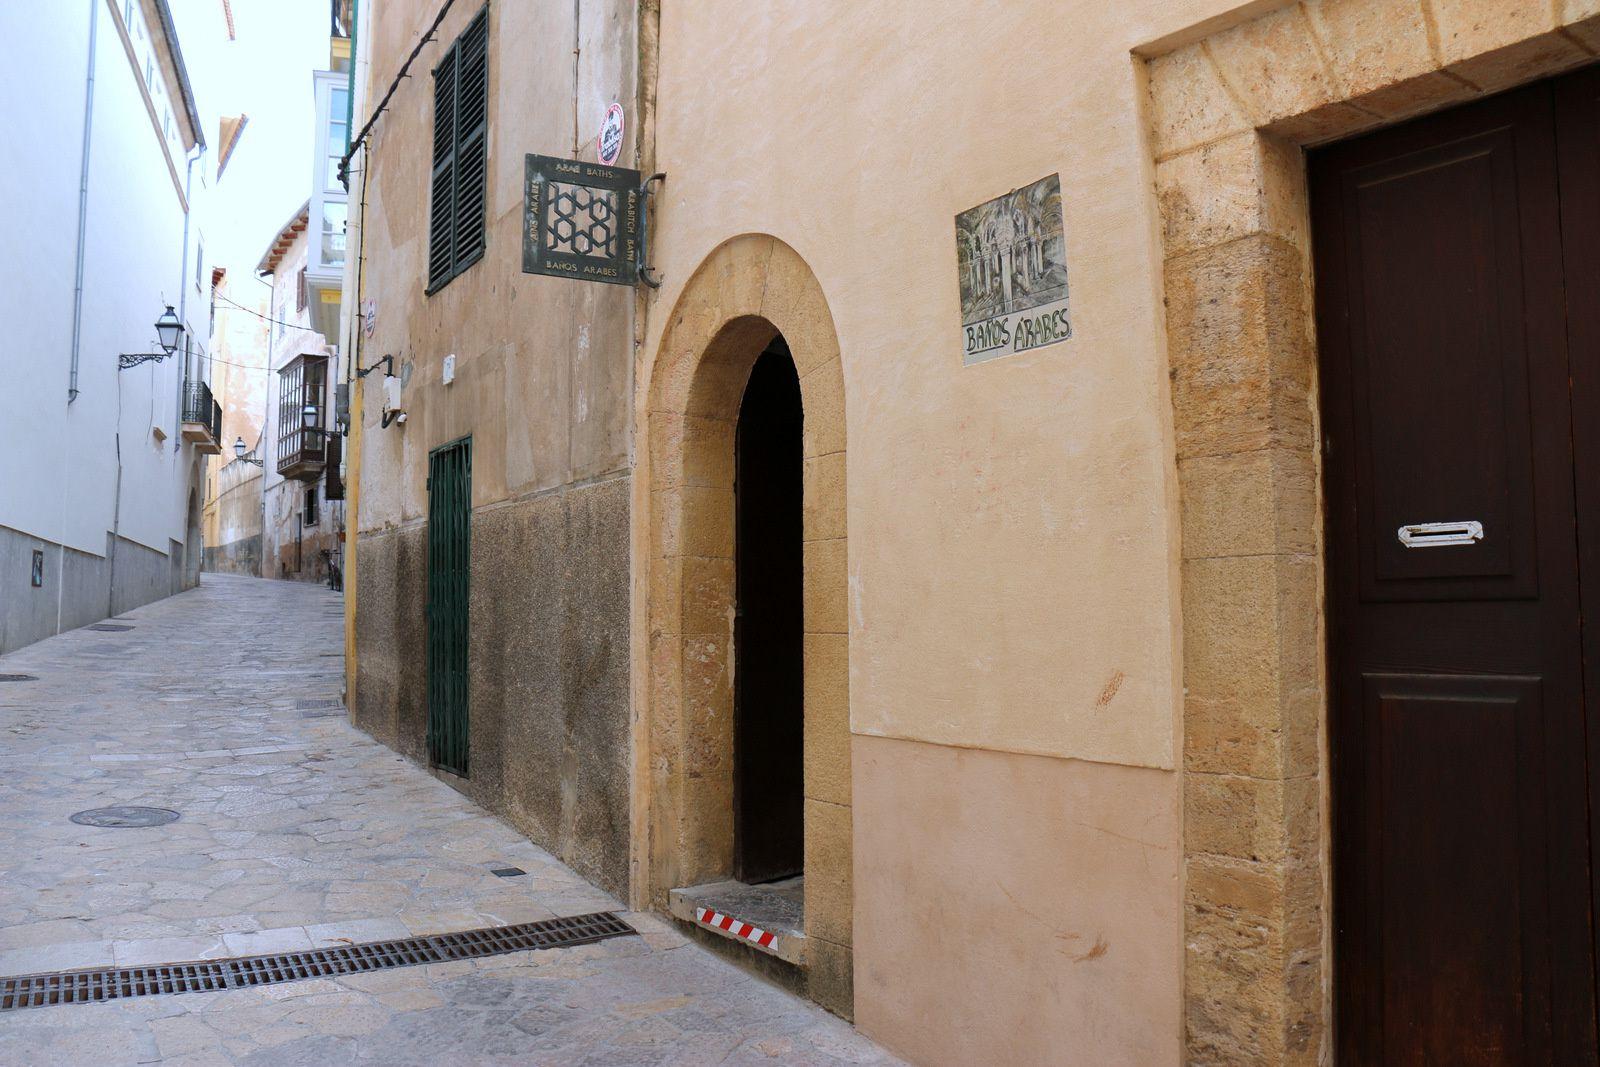 Bains arabes de Palma de Majorque